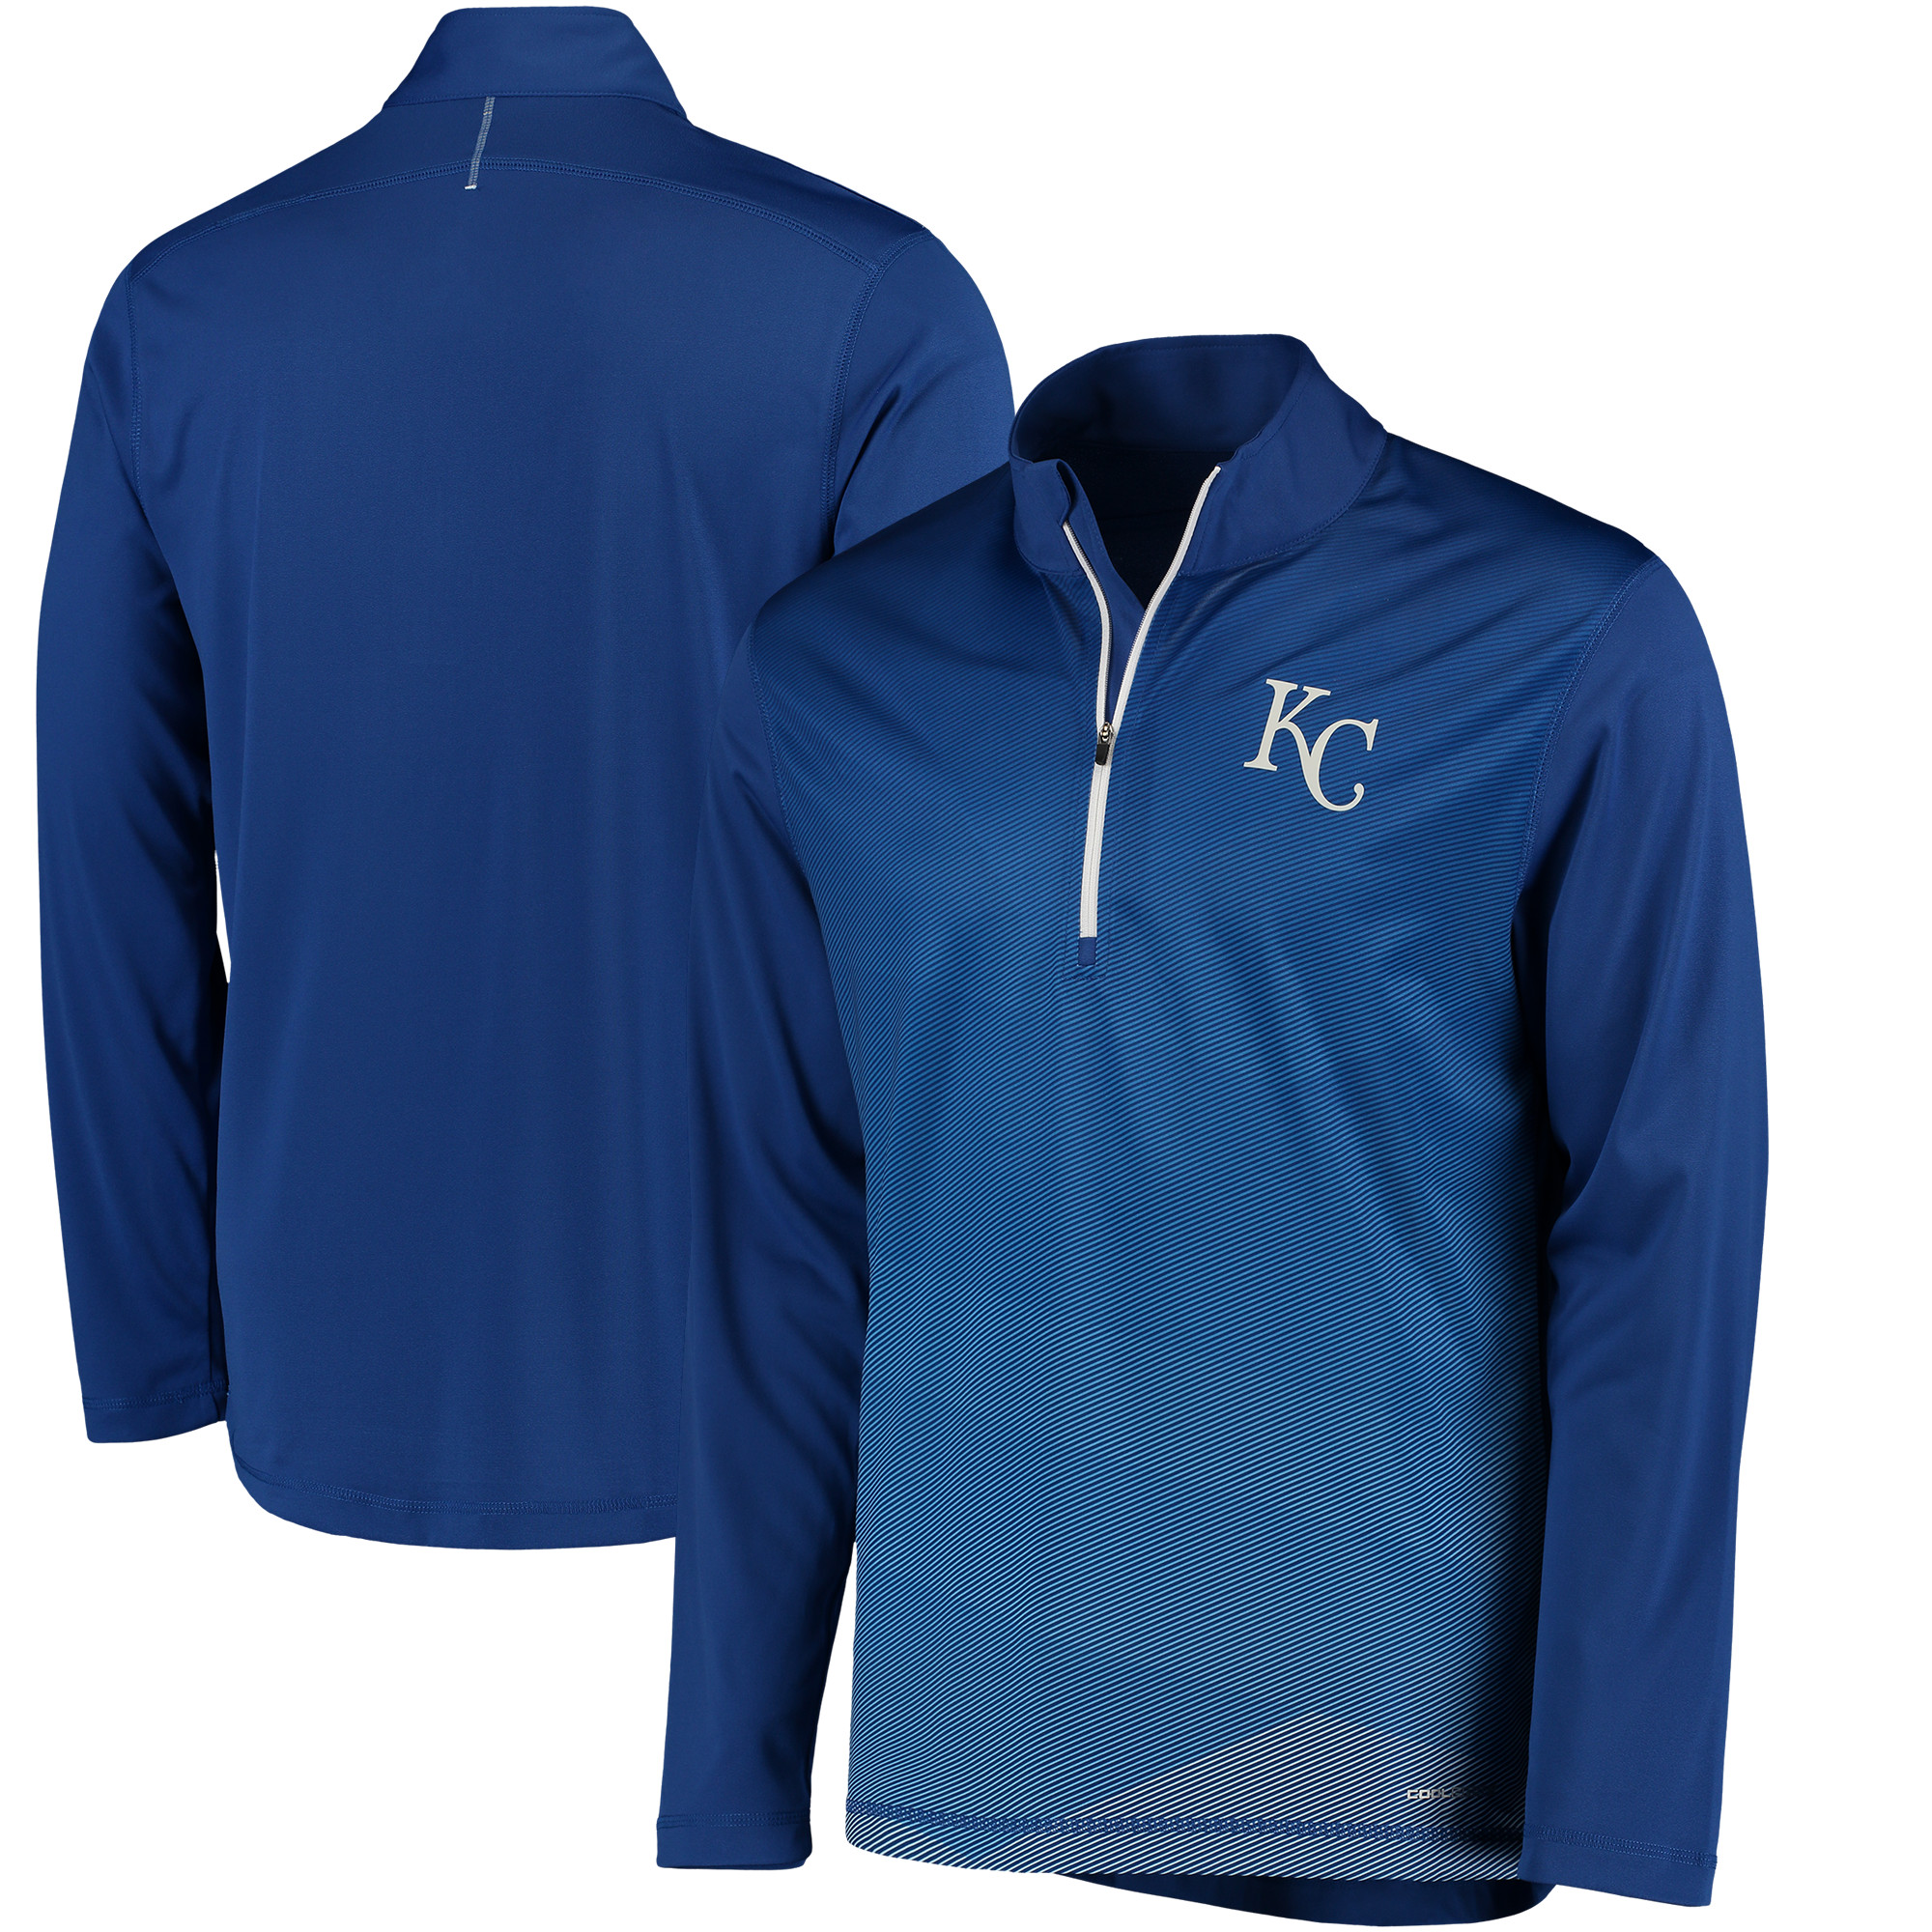 Kansas City Royals Majestic Good and Improved Contrast Zephyr Half-Zip Lightweight Pullover Cool Base Jacket - Heather Royal